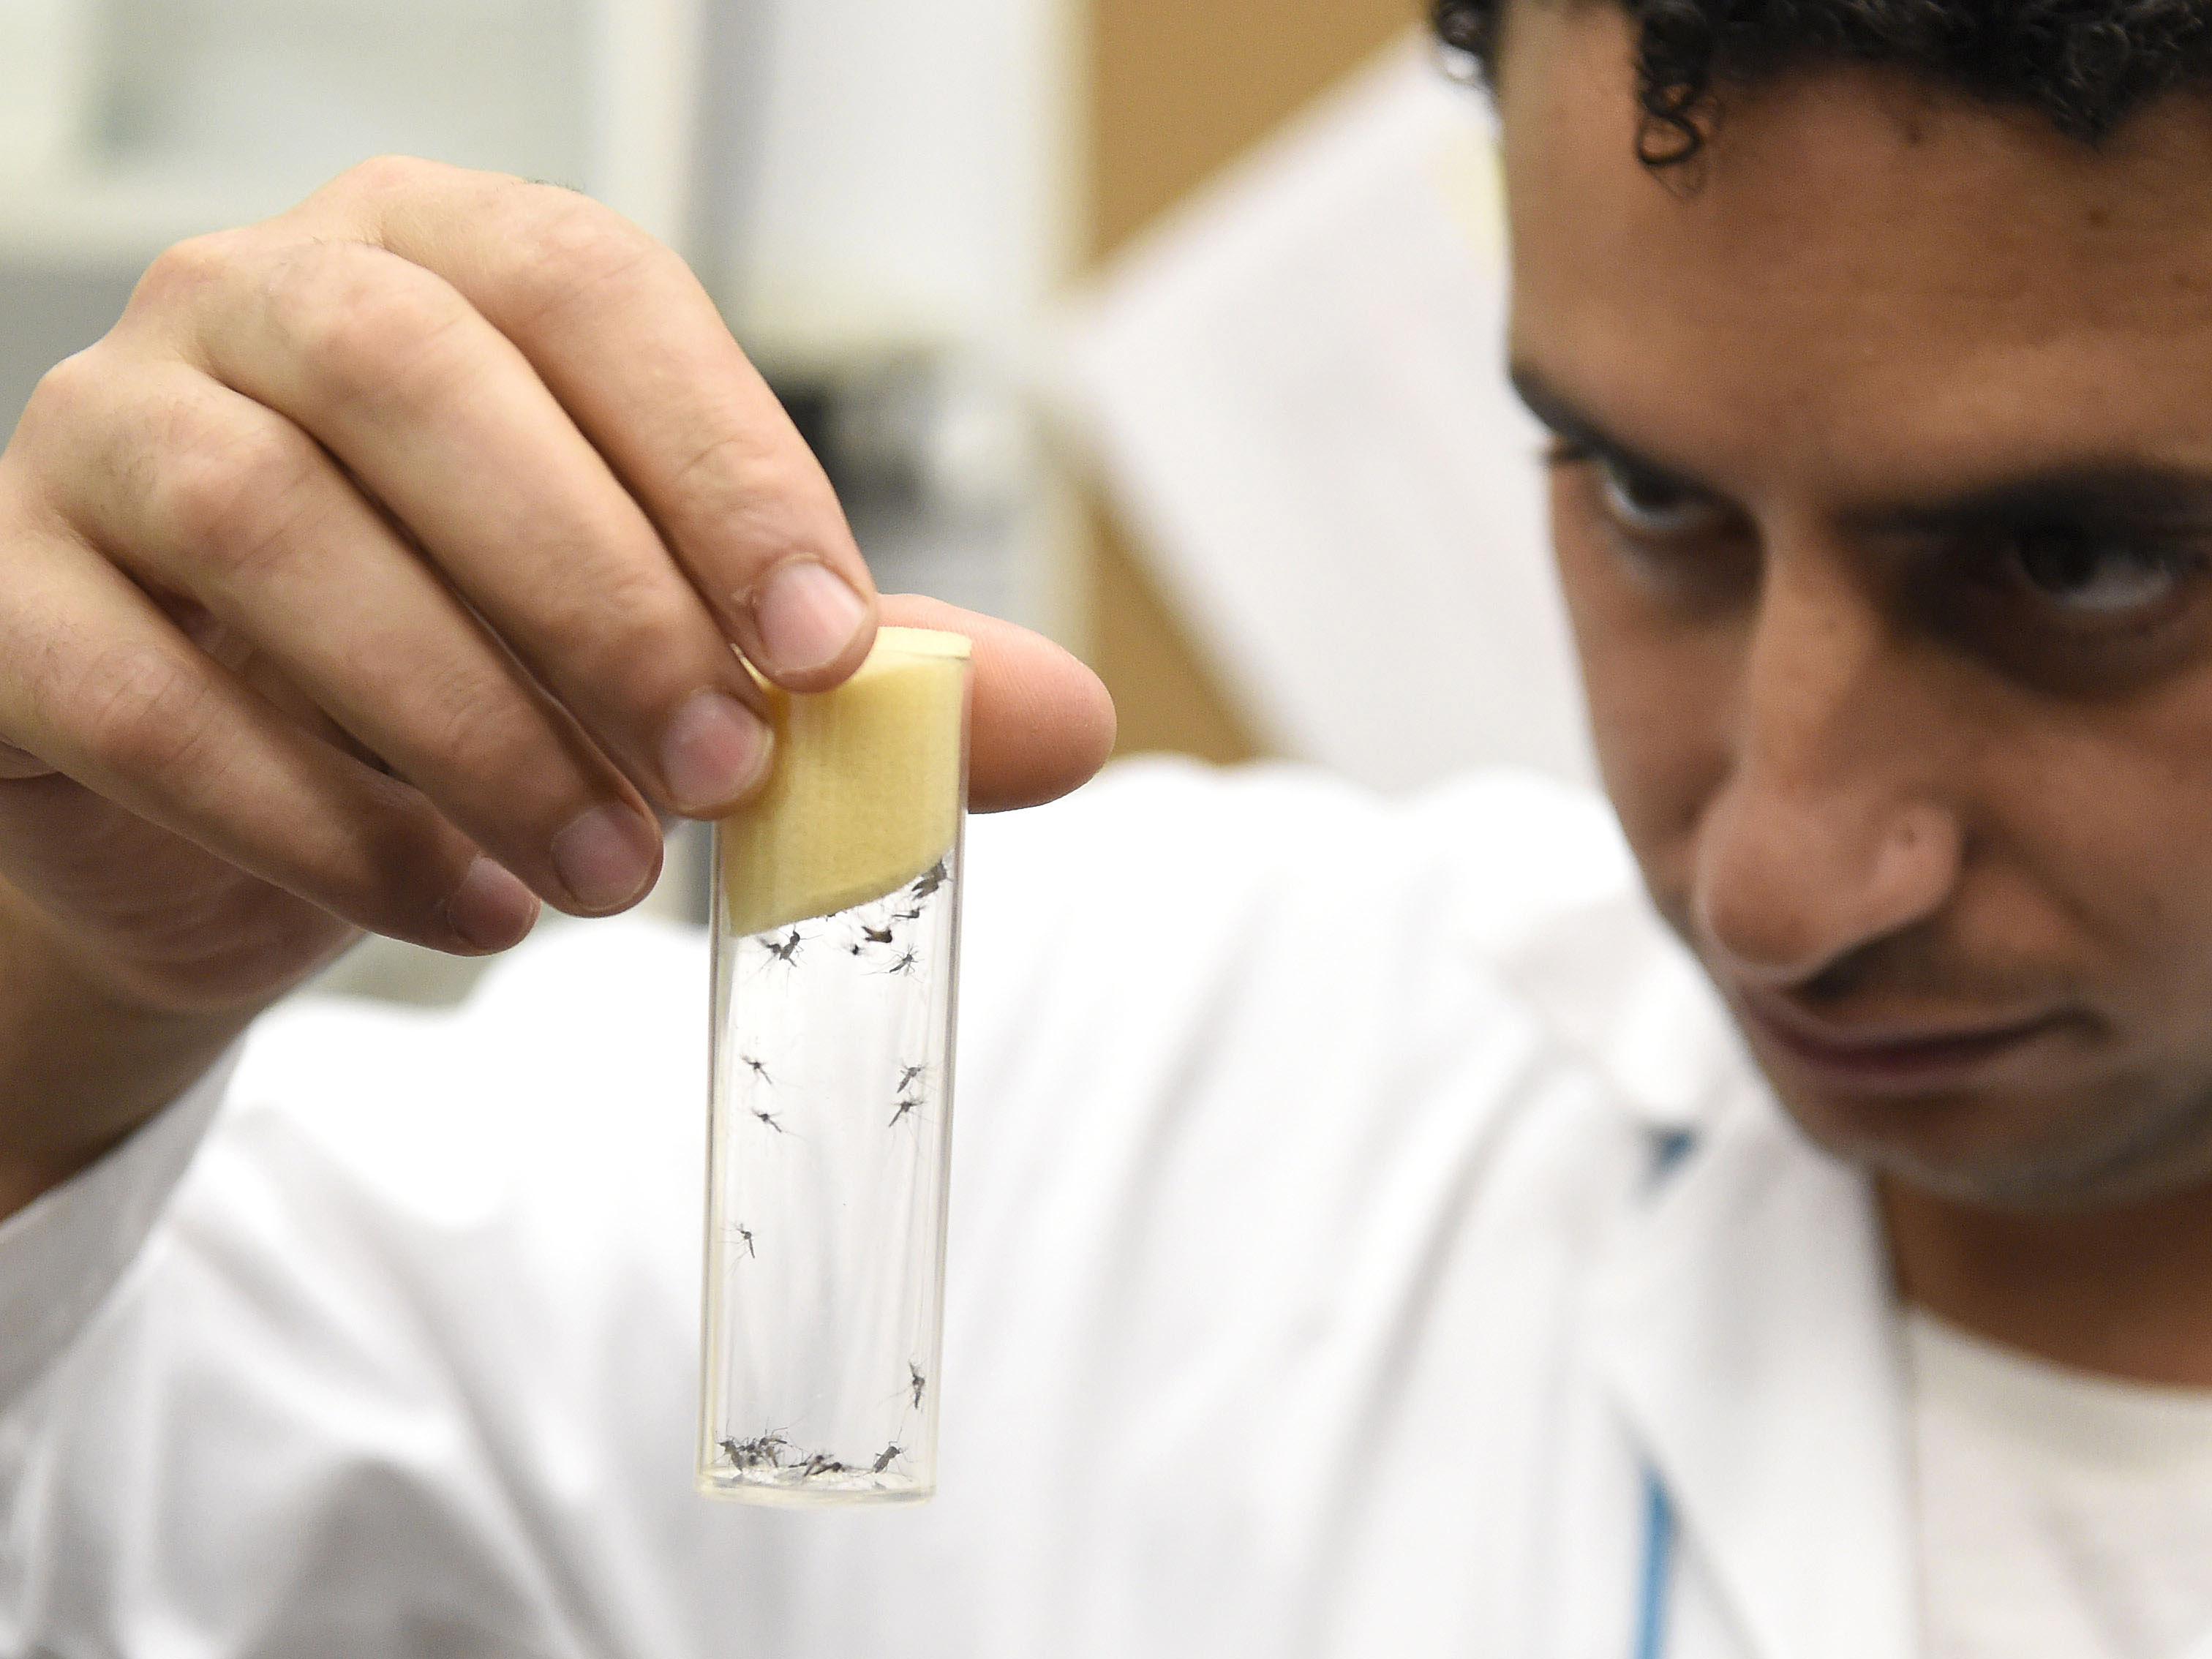 AUSTRIA-SCIENCE-HEALTH-IAEA-ZIKA